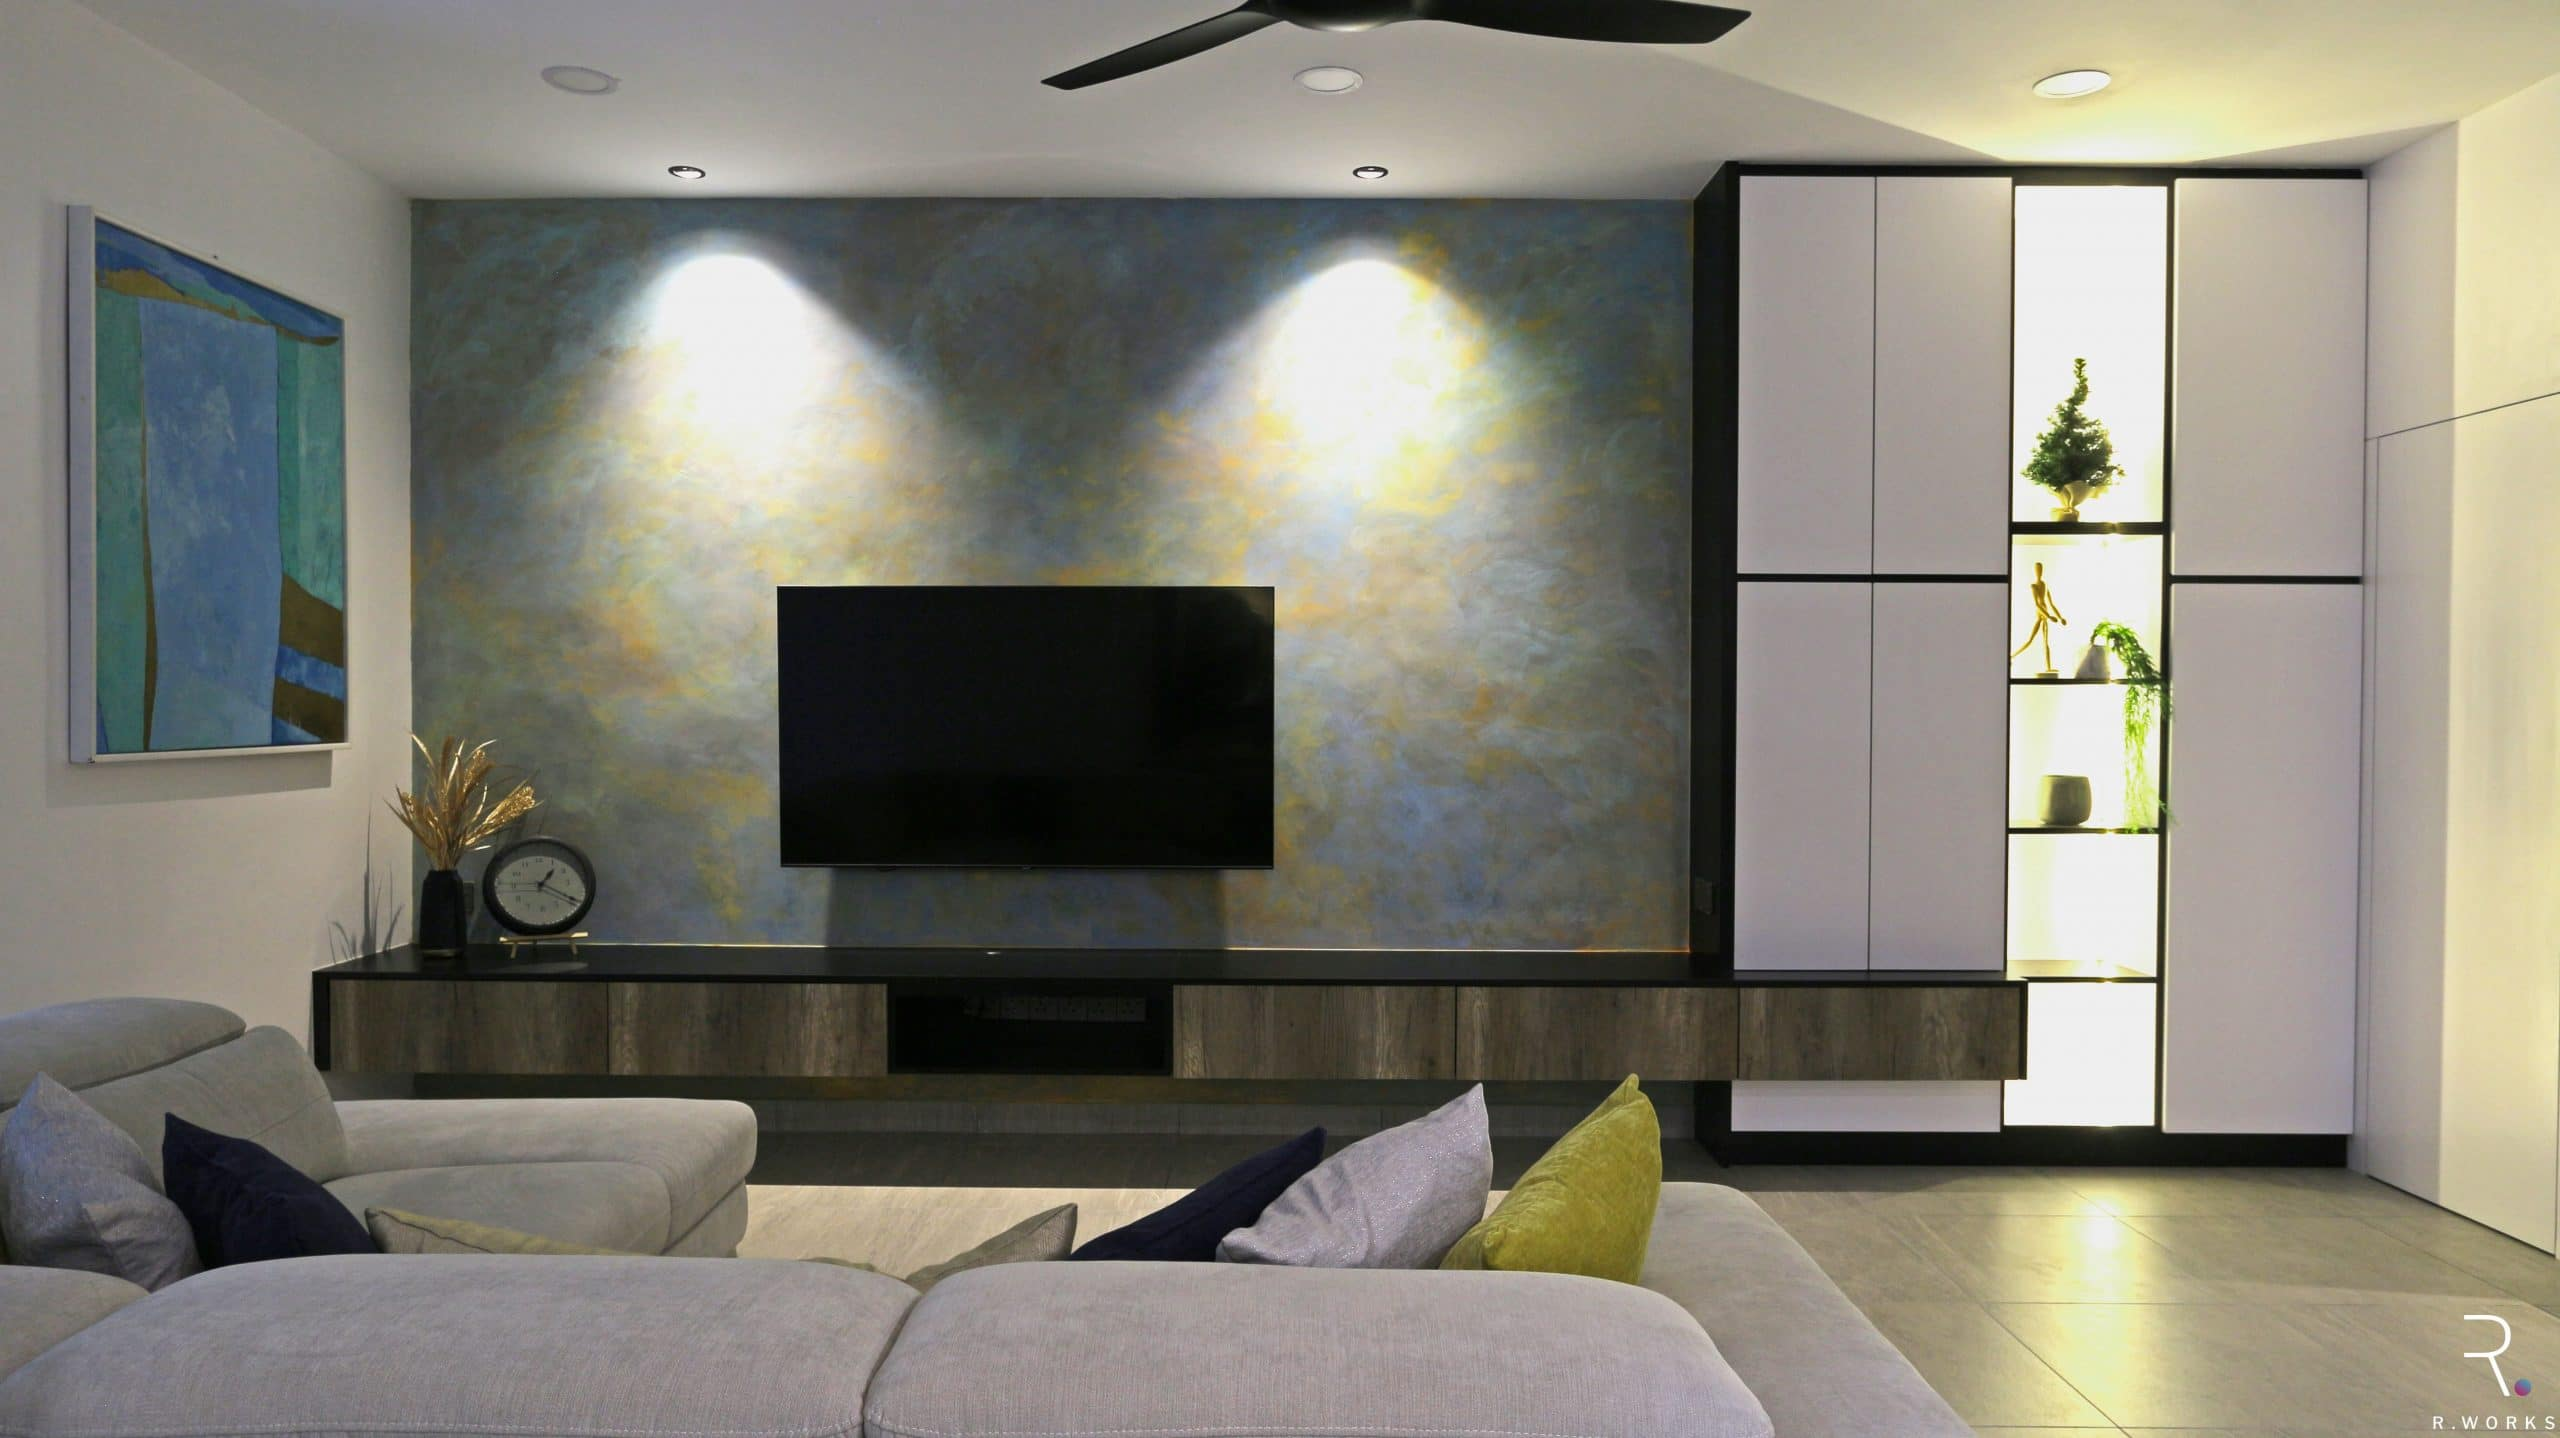 Townhouse living room design after interior design